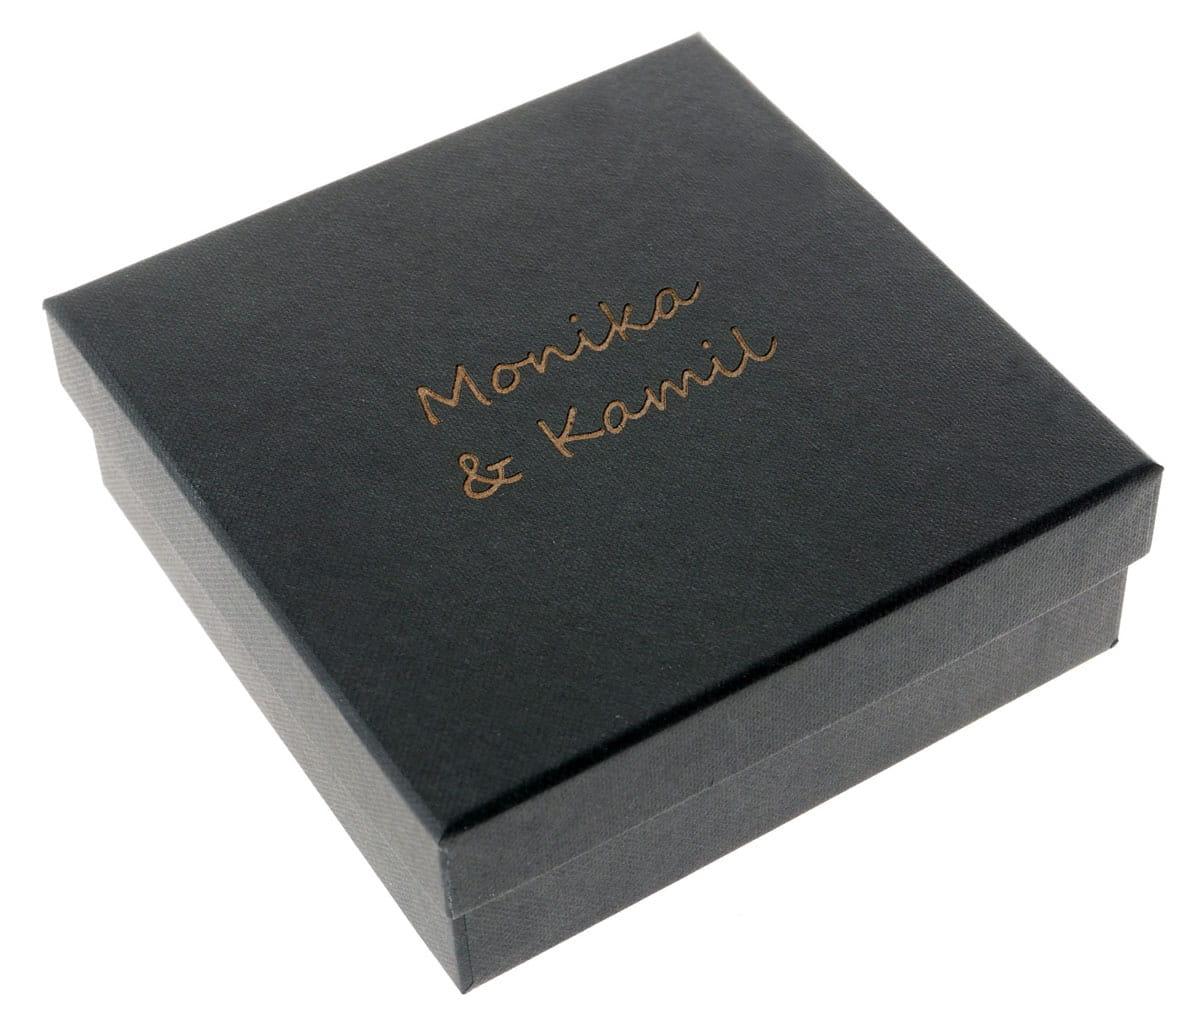 Pudełko Na Pendrive Z Grawerem Black Box Fotokowalski Pl